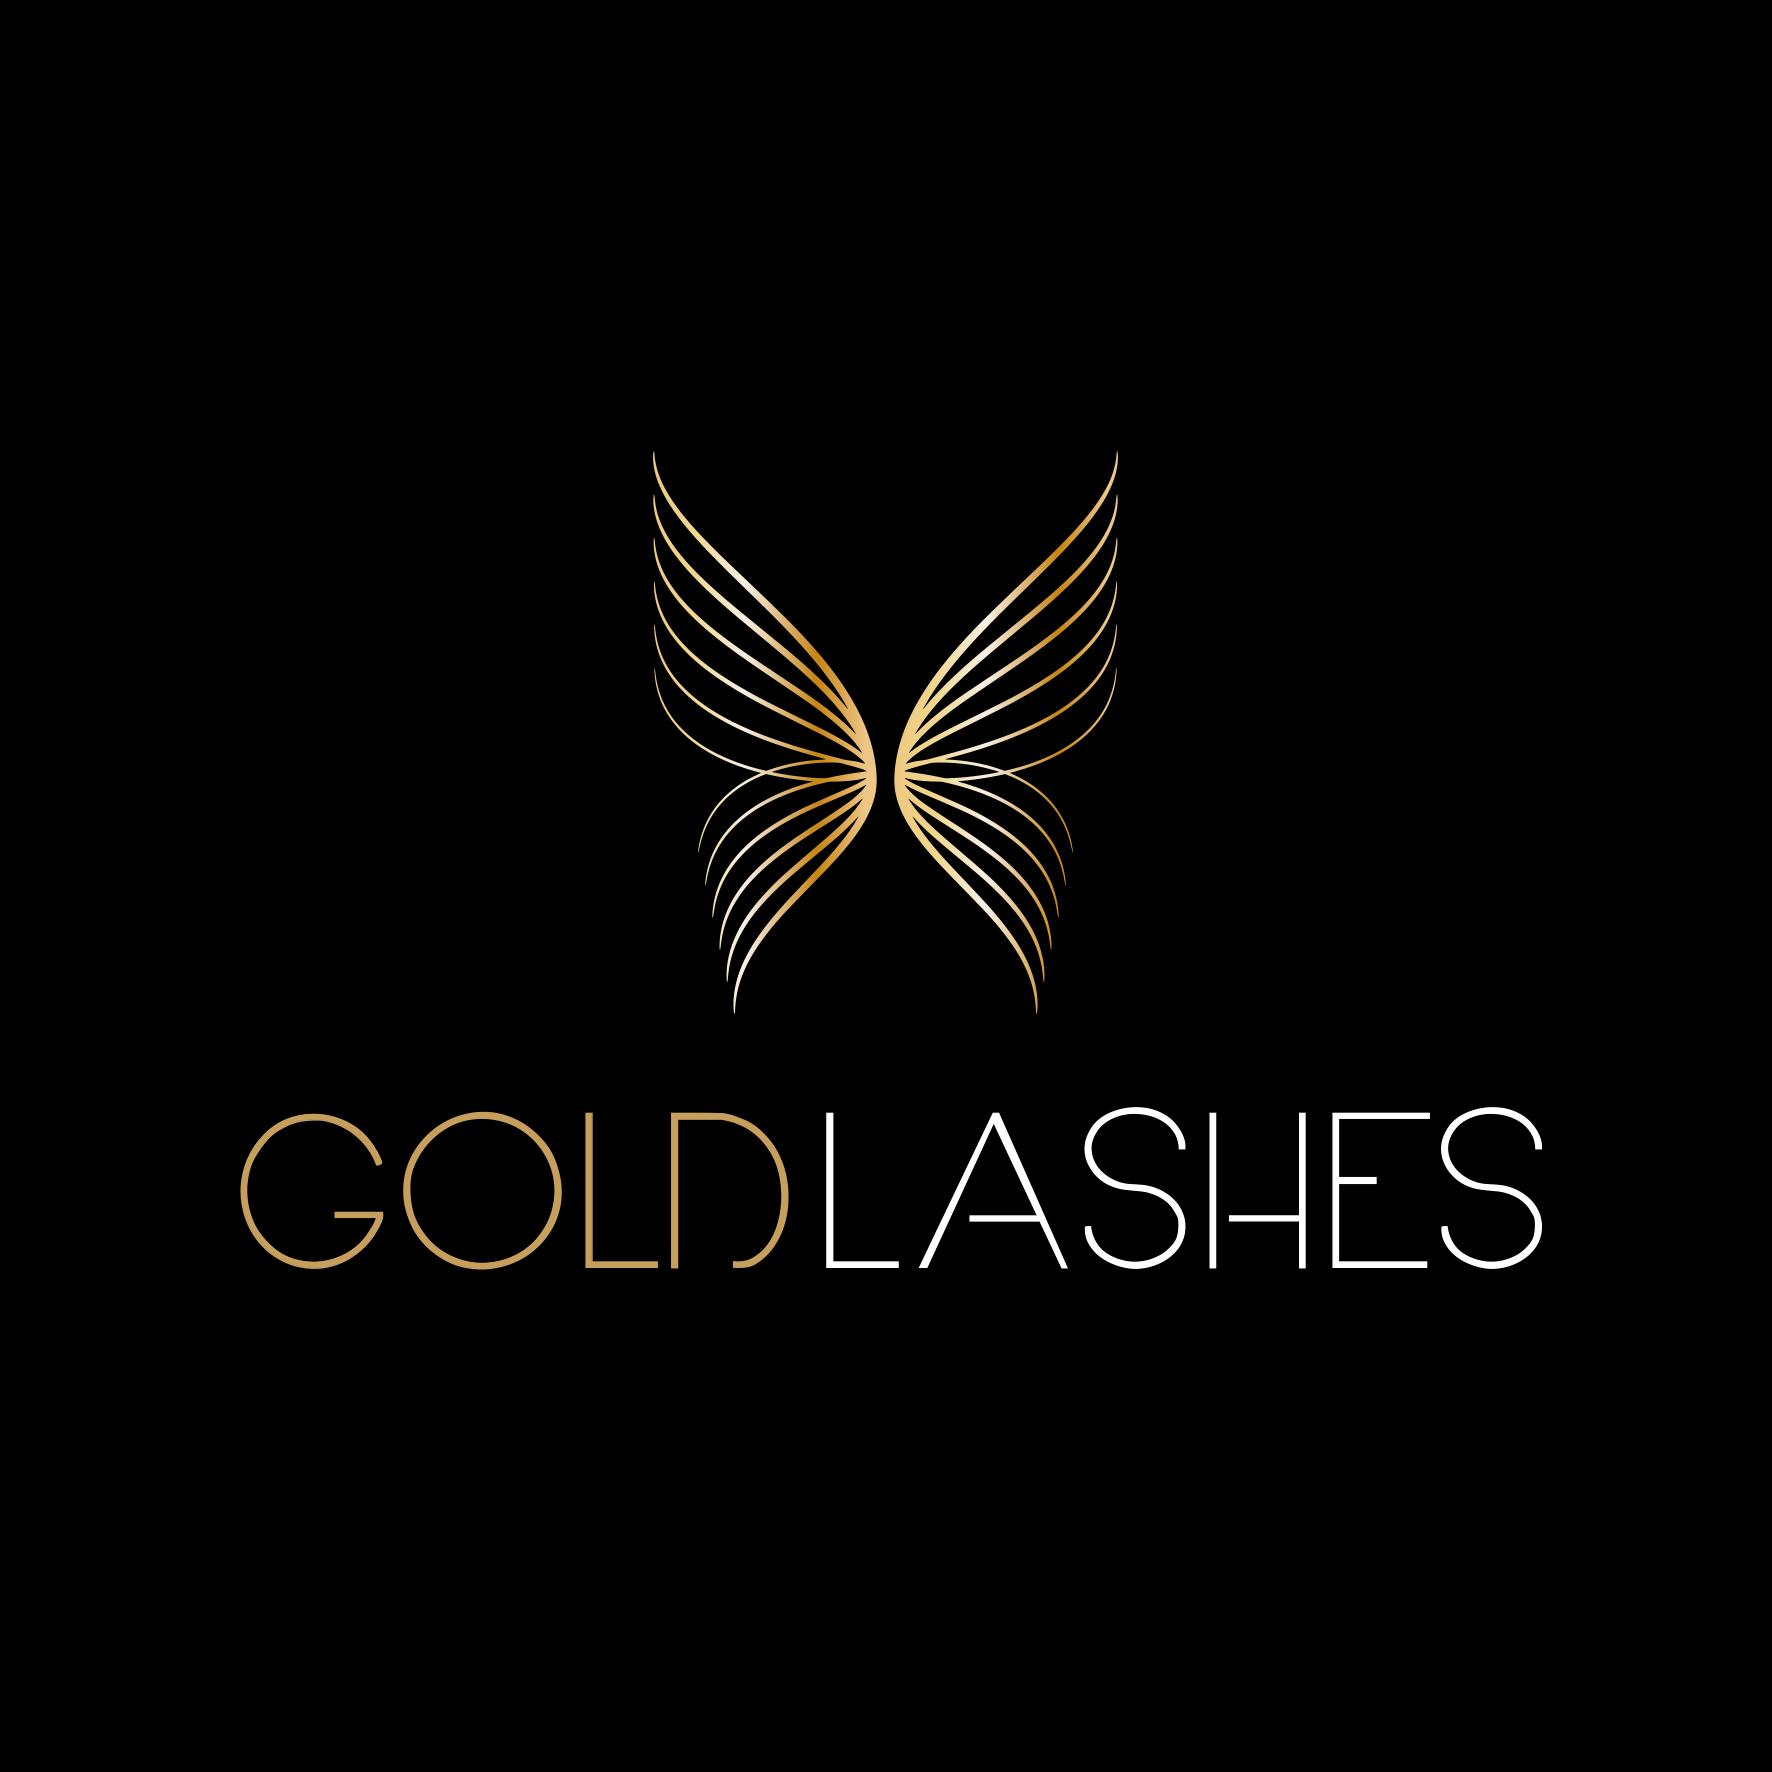 GoldLashes.png